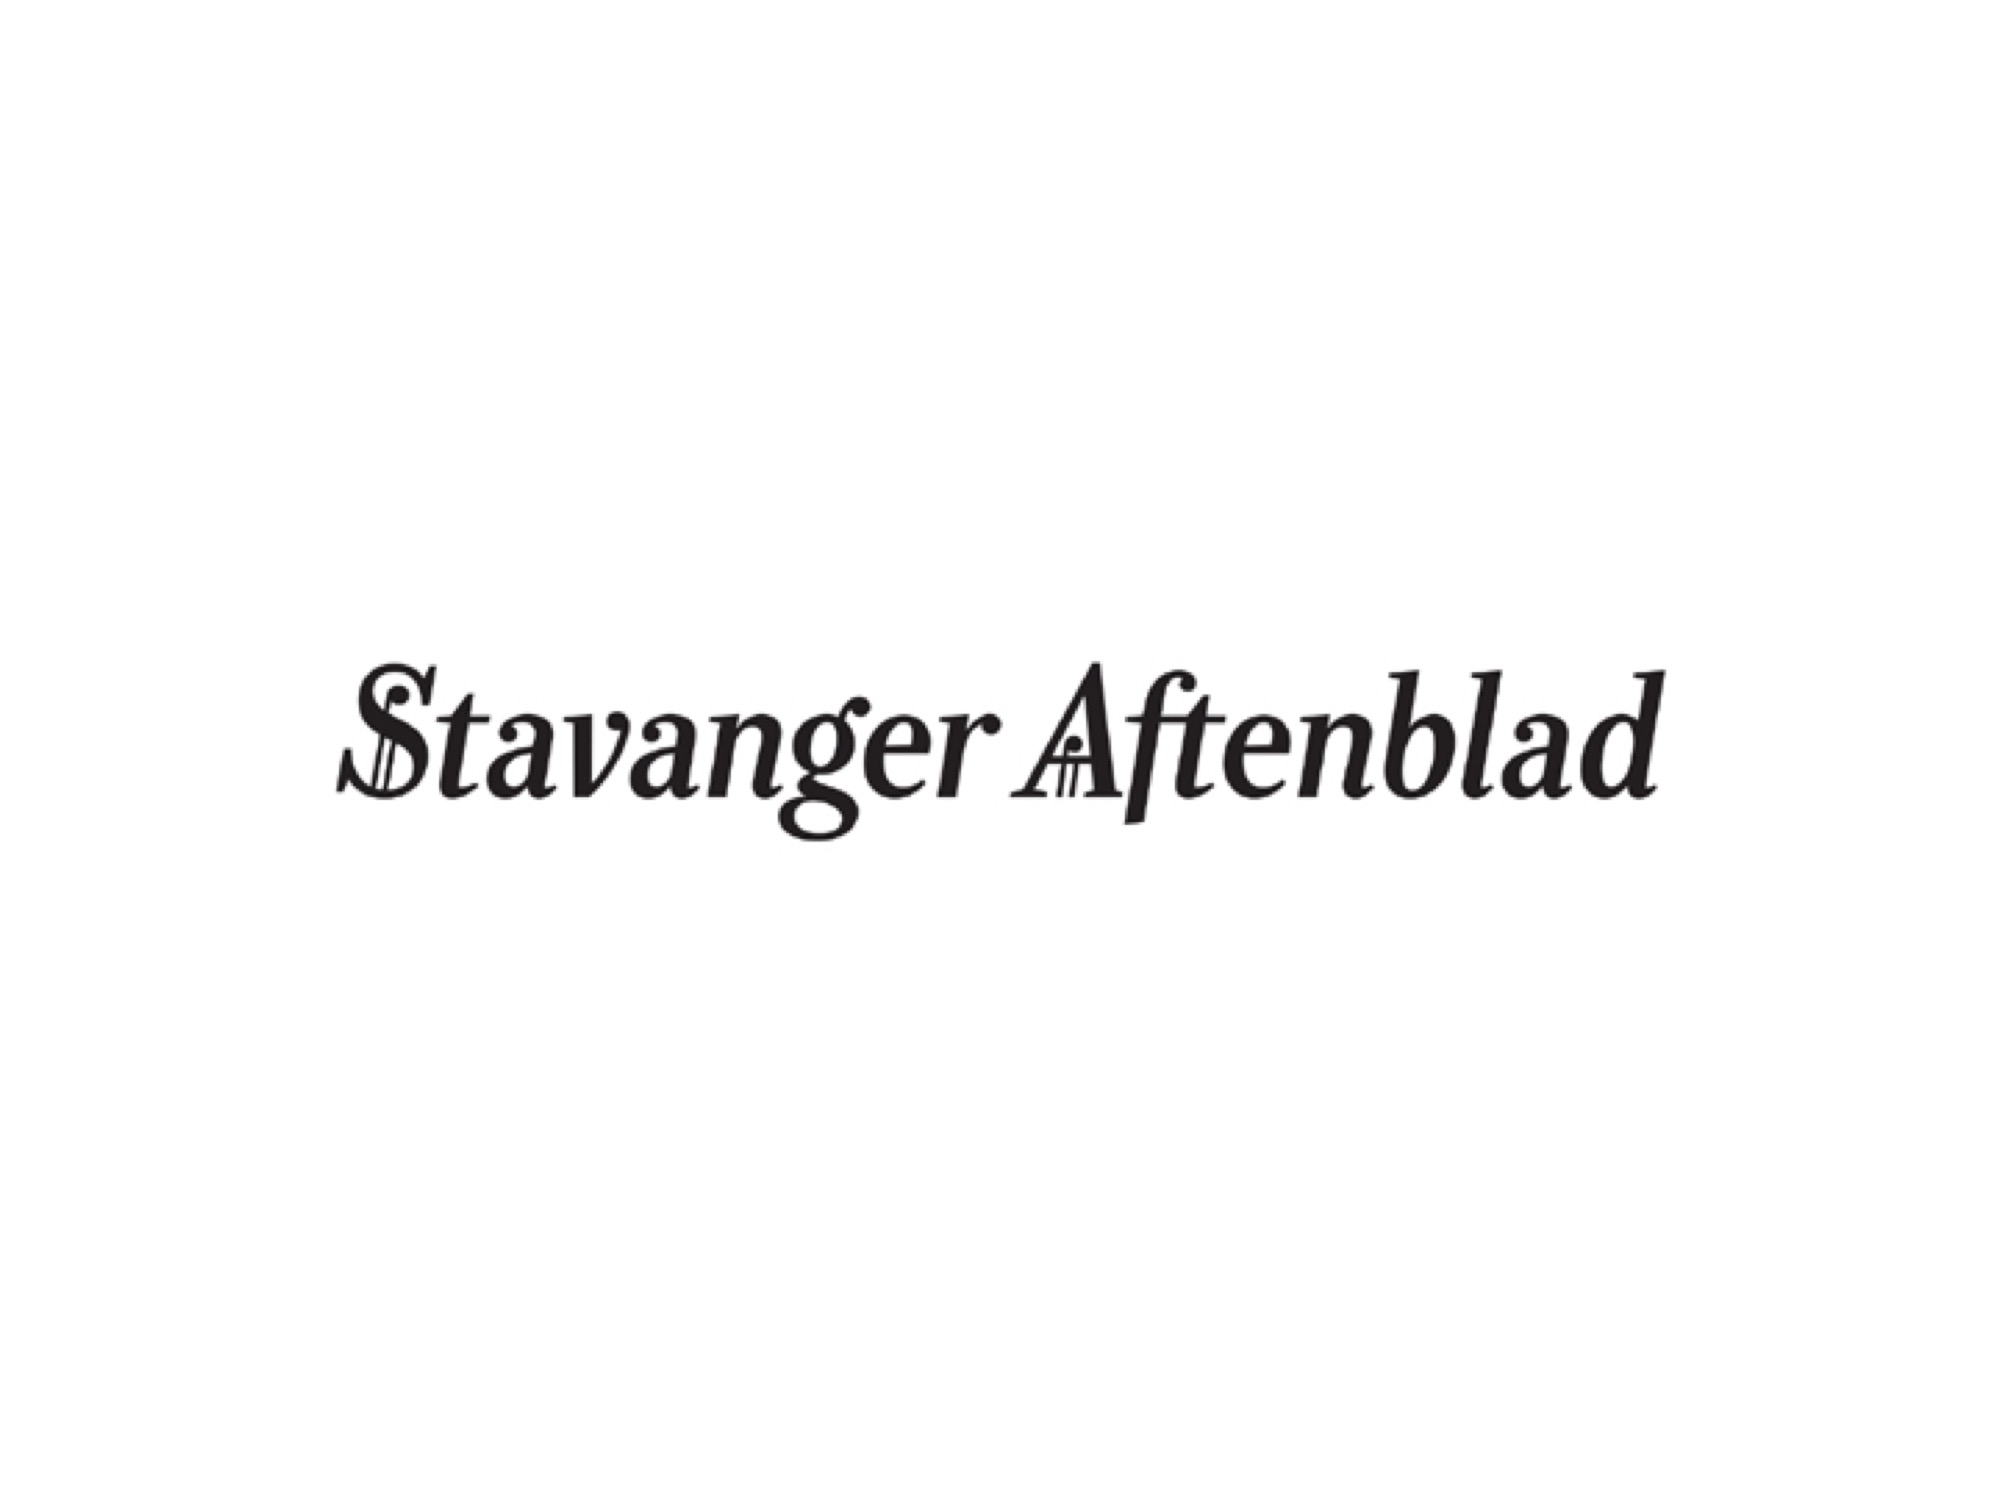 StavangerAftenblad.jpg